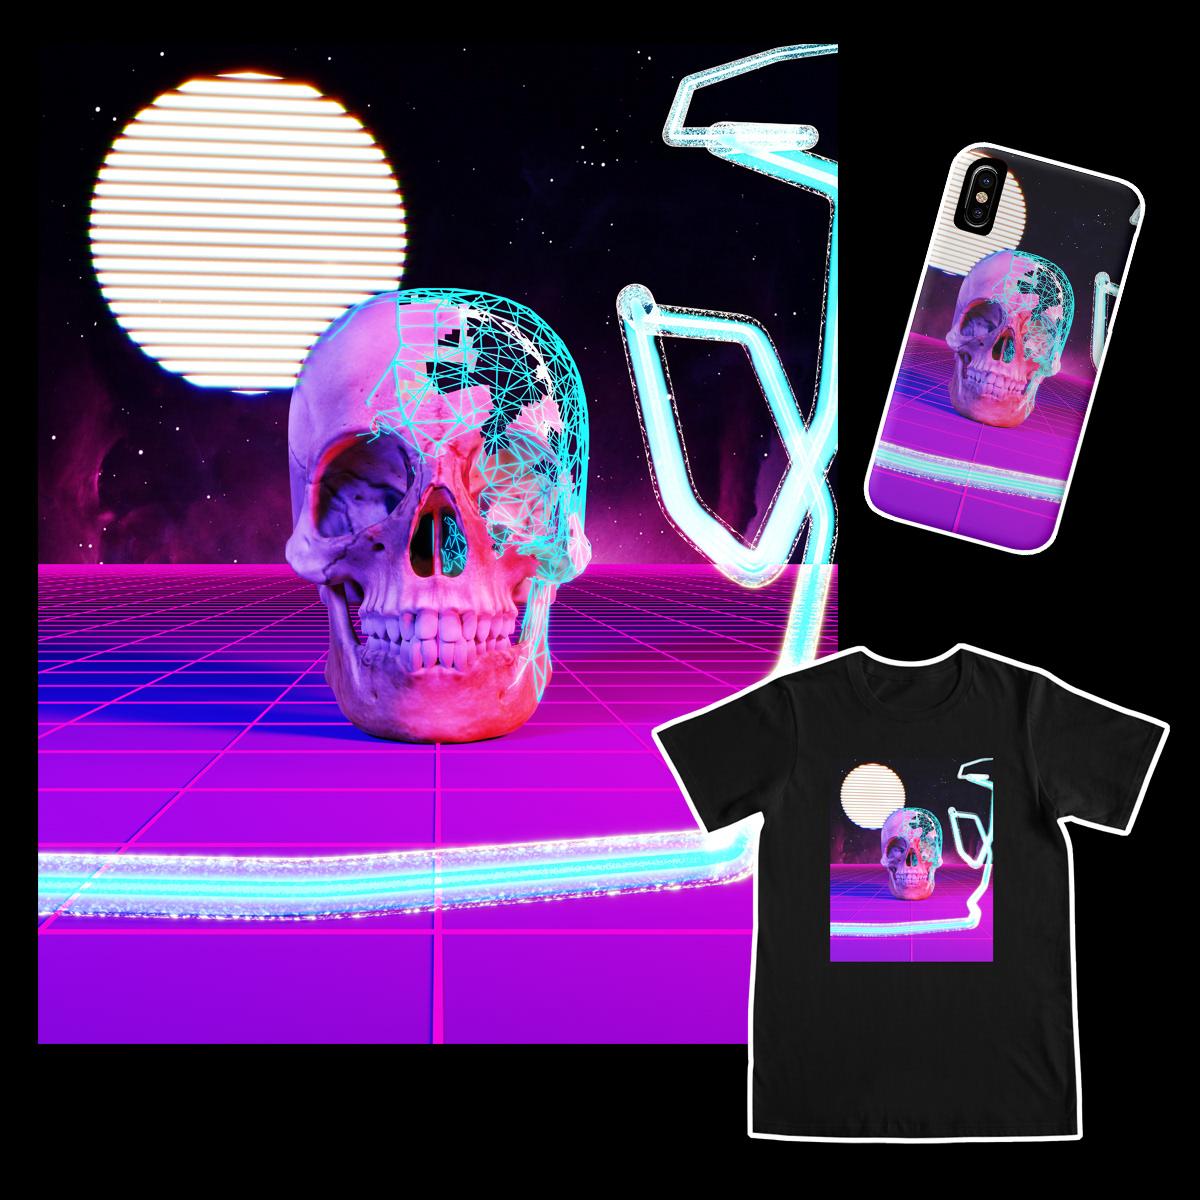 3D abstract blender Cyberpunk Digital Art  Render Retro sci-fi Synthwave vaporwave